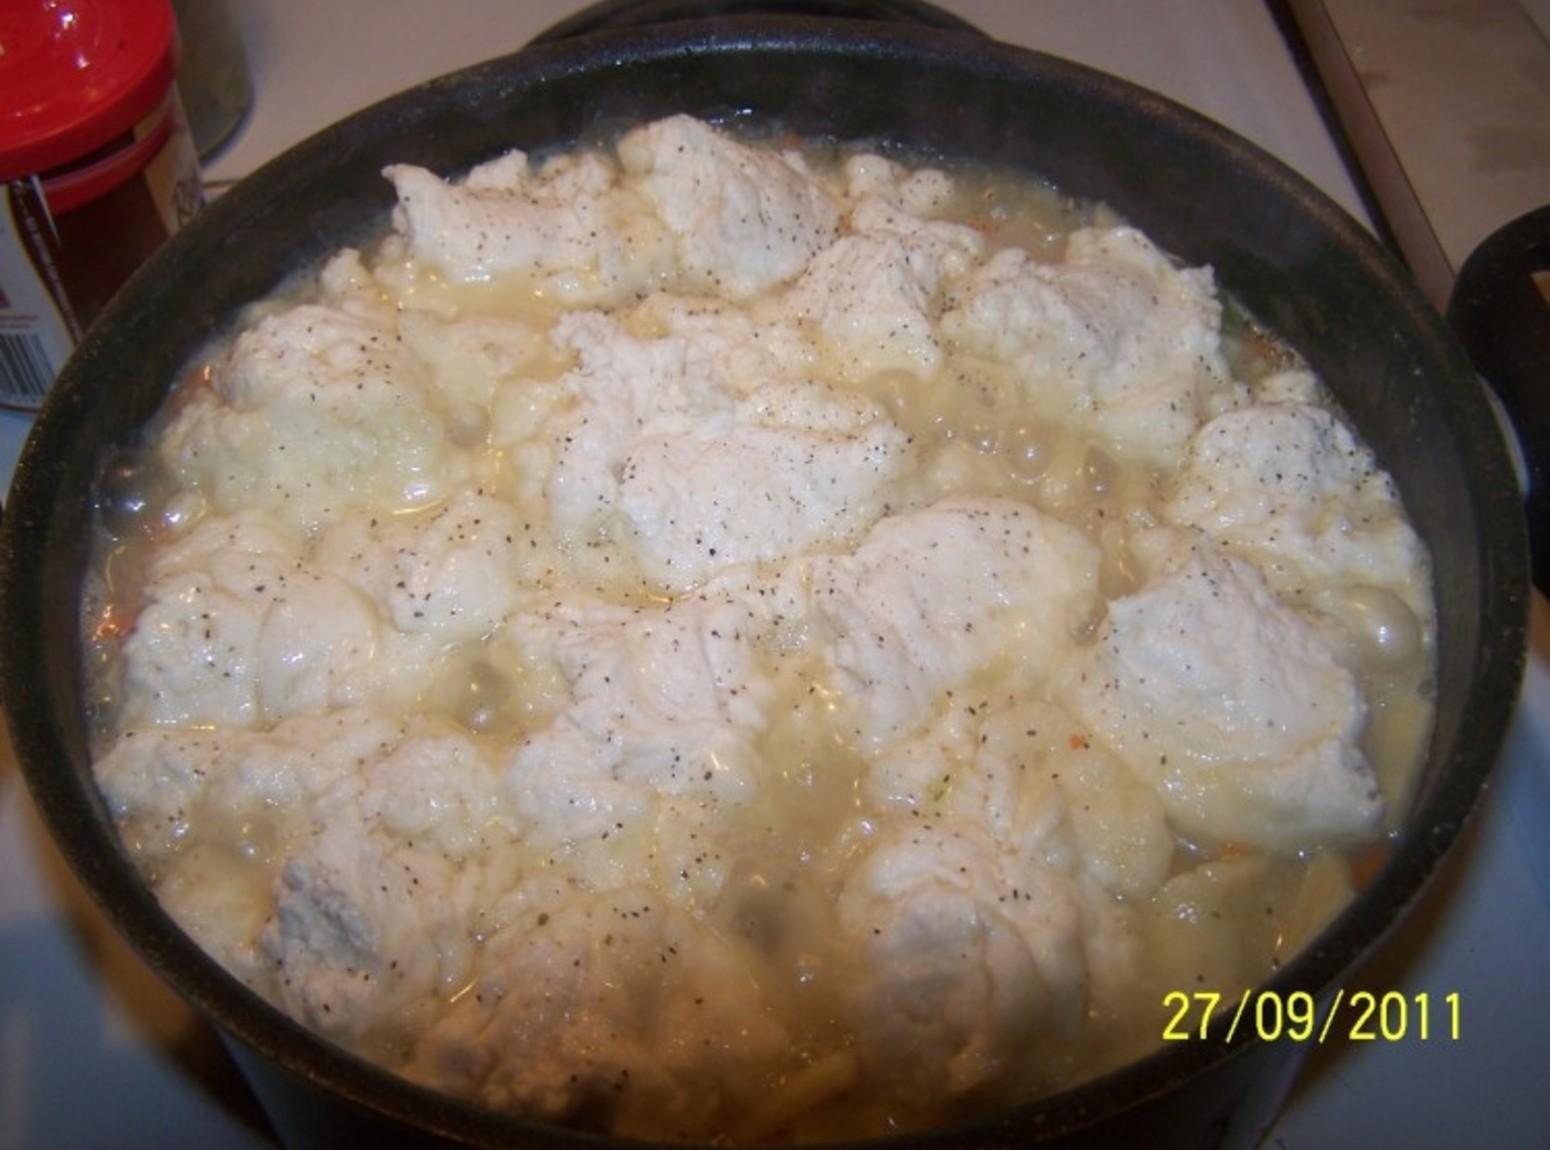 Homemade Chicken n Noodles with Dumplings Recipe